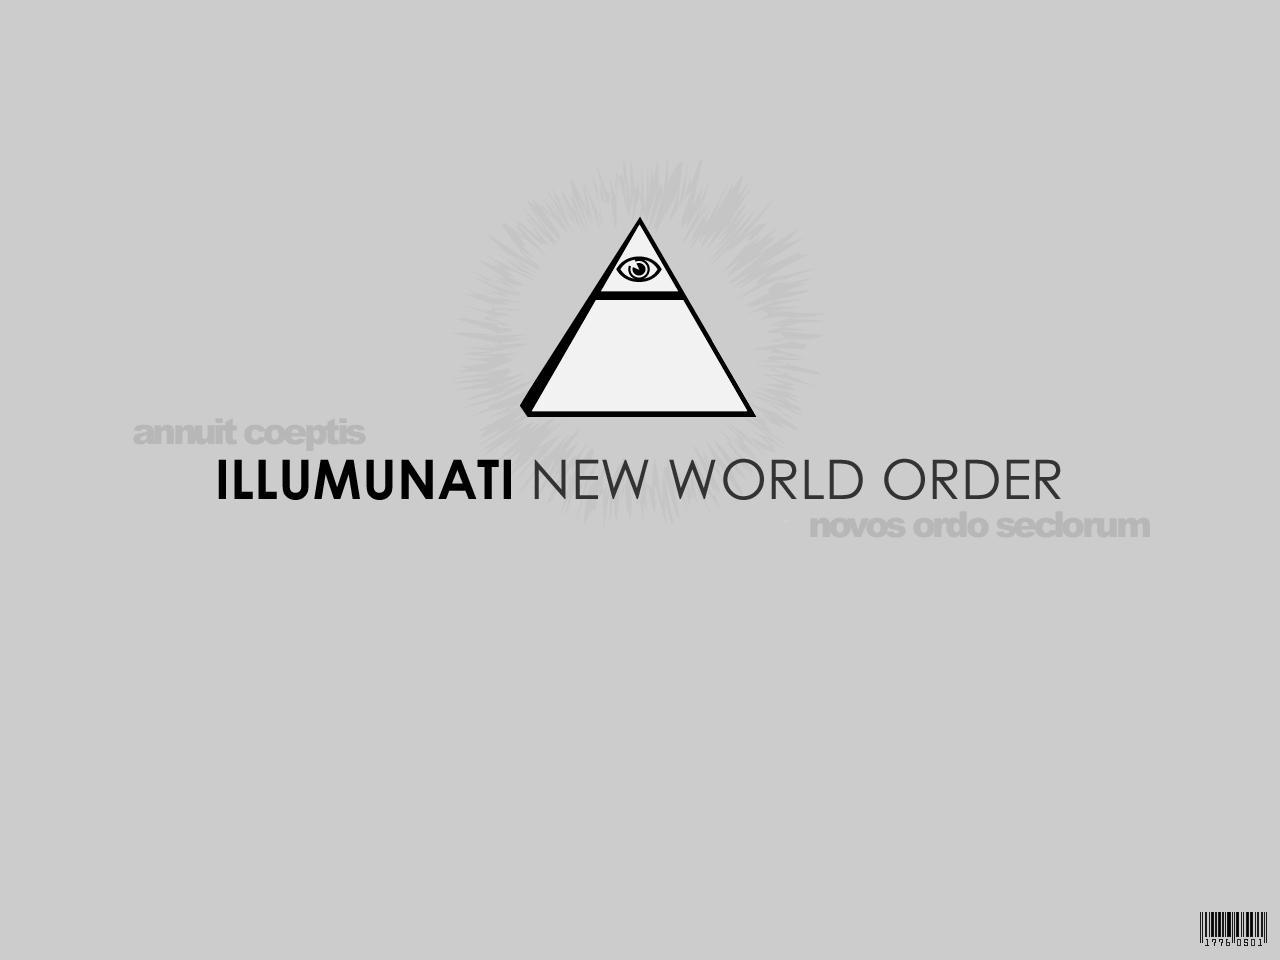 Illuminati by knarkdocka